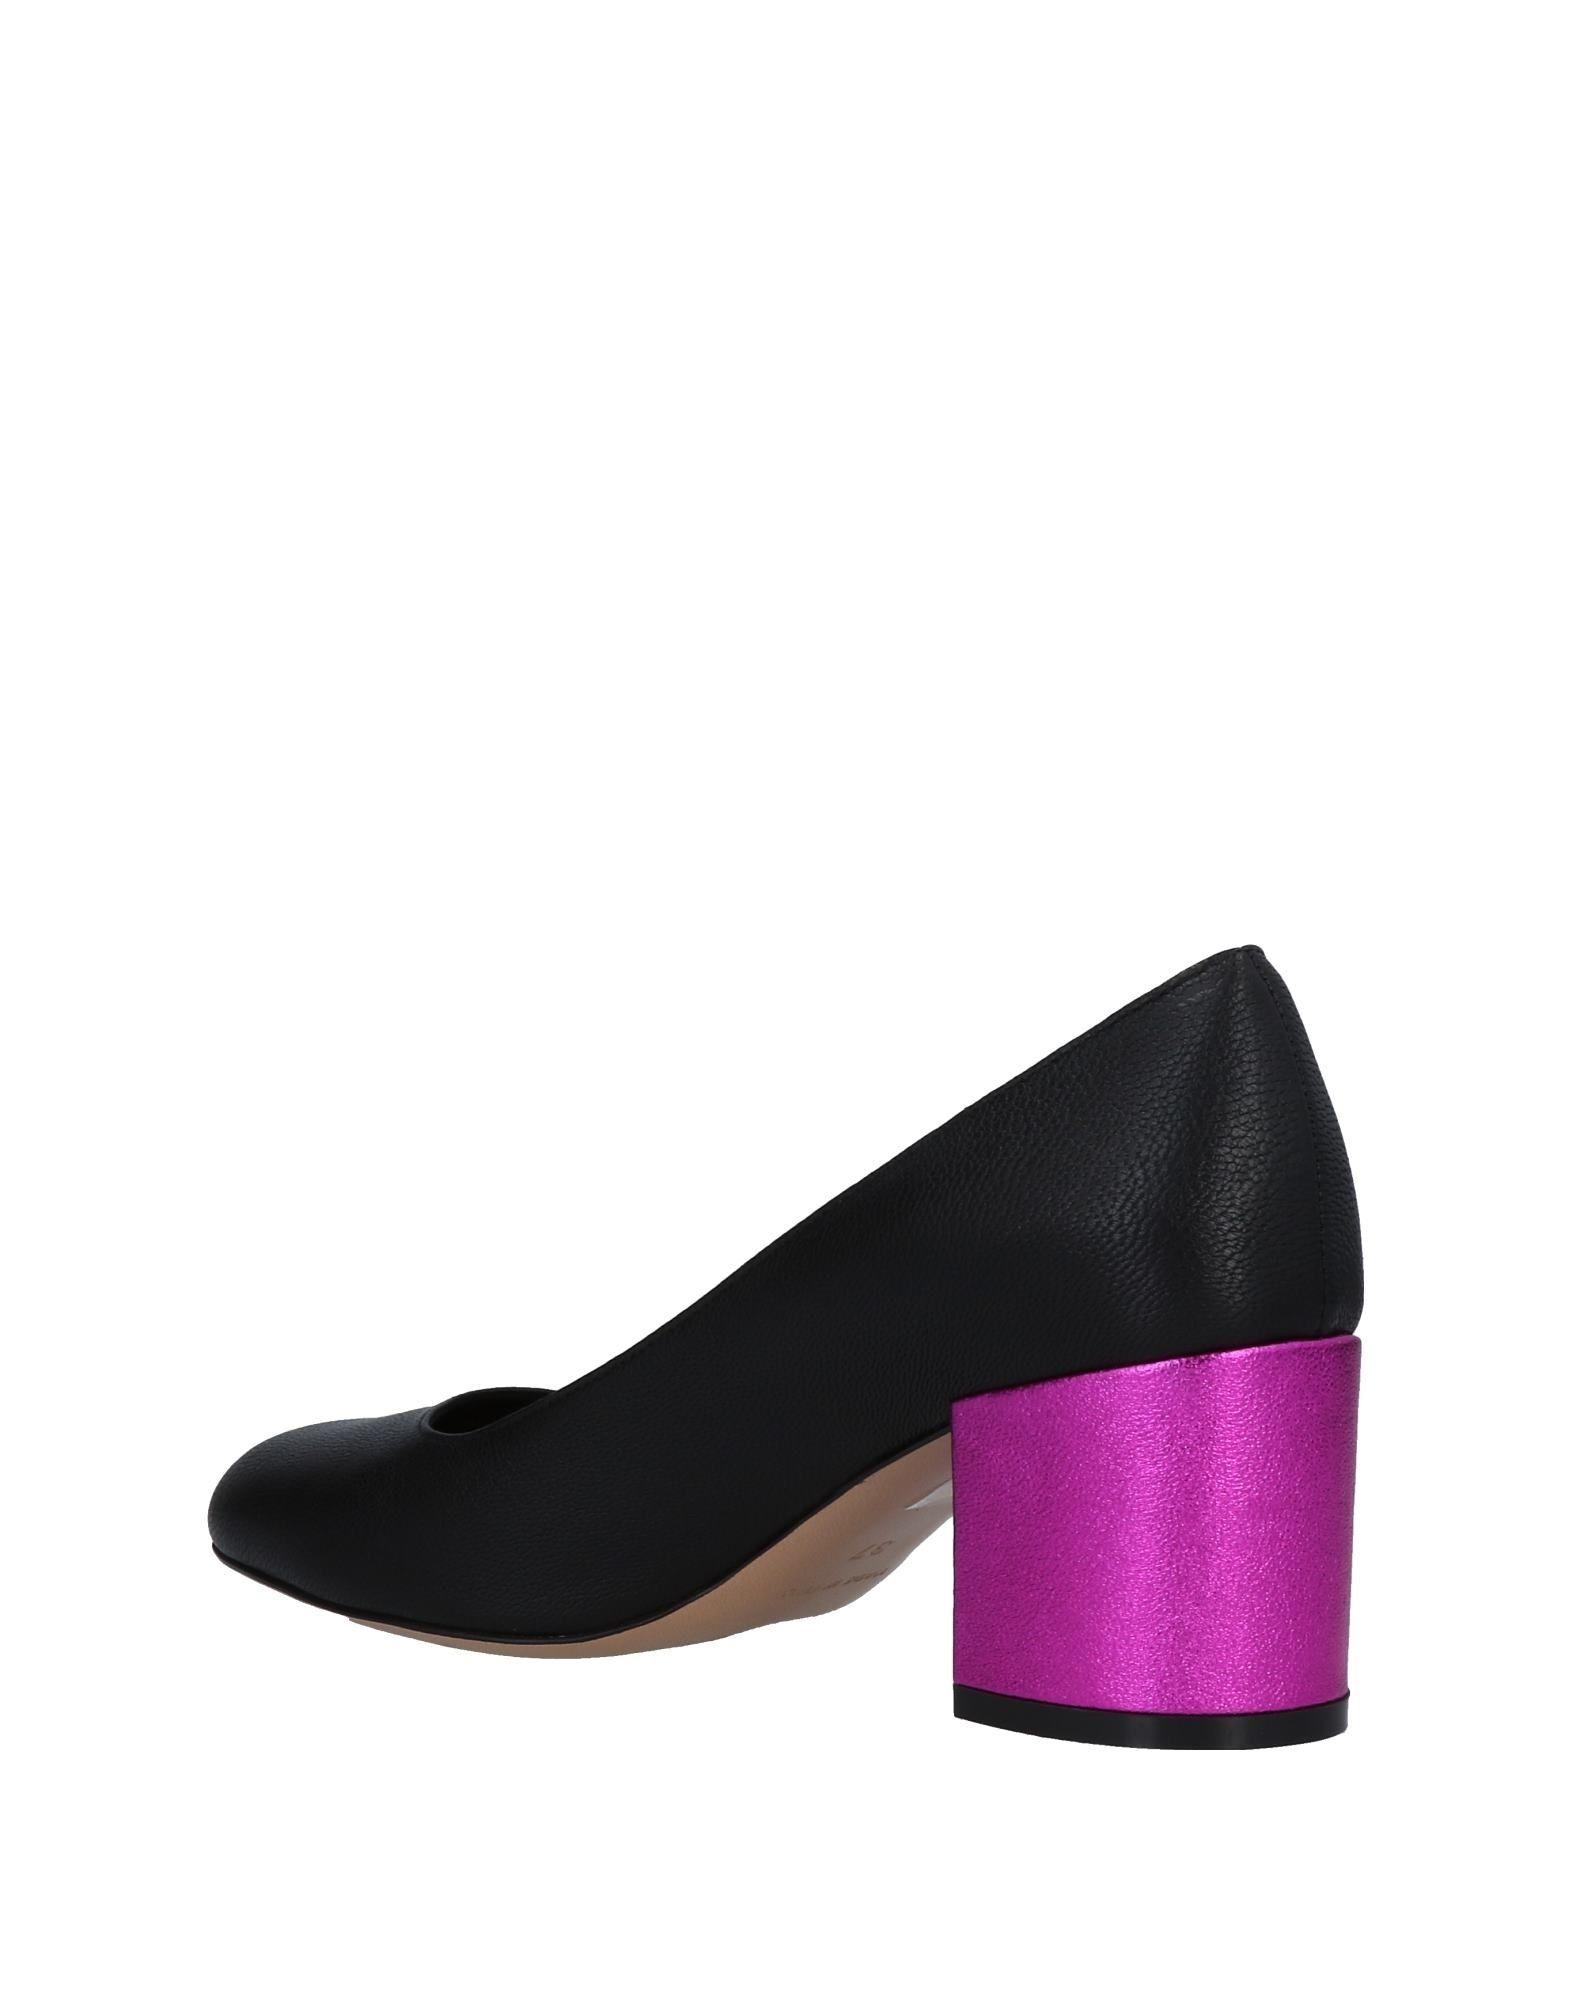 Prezioso Pumps Qualität Damen  11491105TL Gute Qualität Pumps beliebte Schuhe 0f2b94